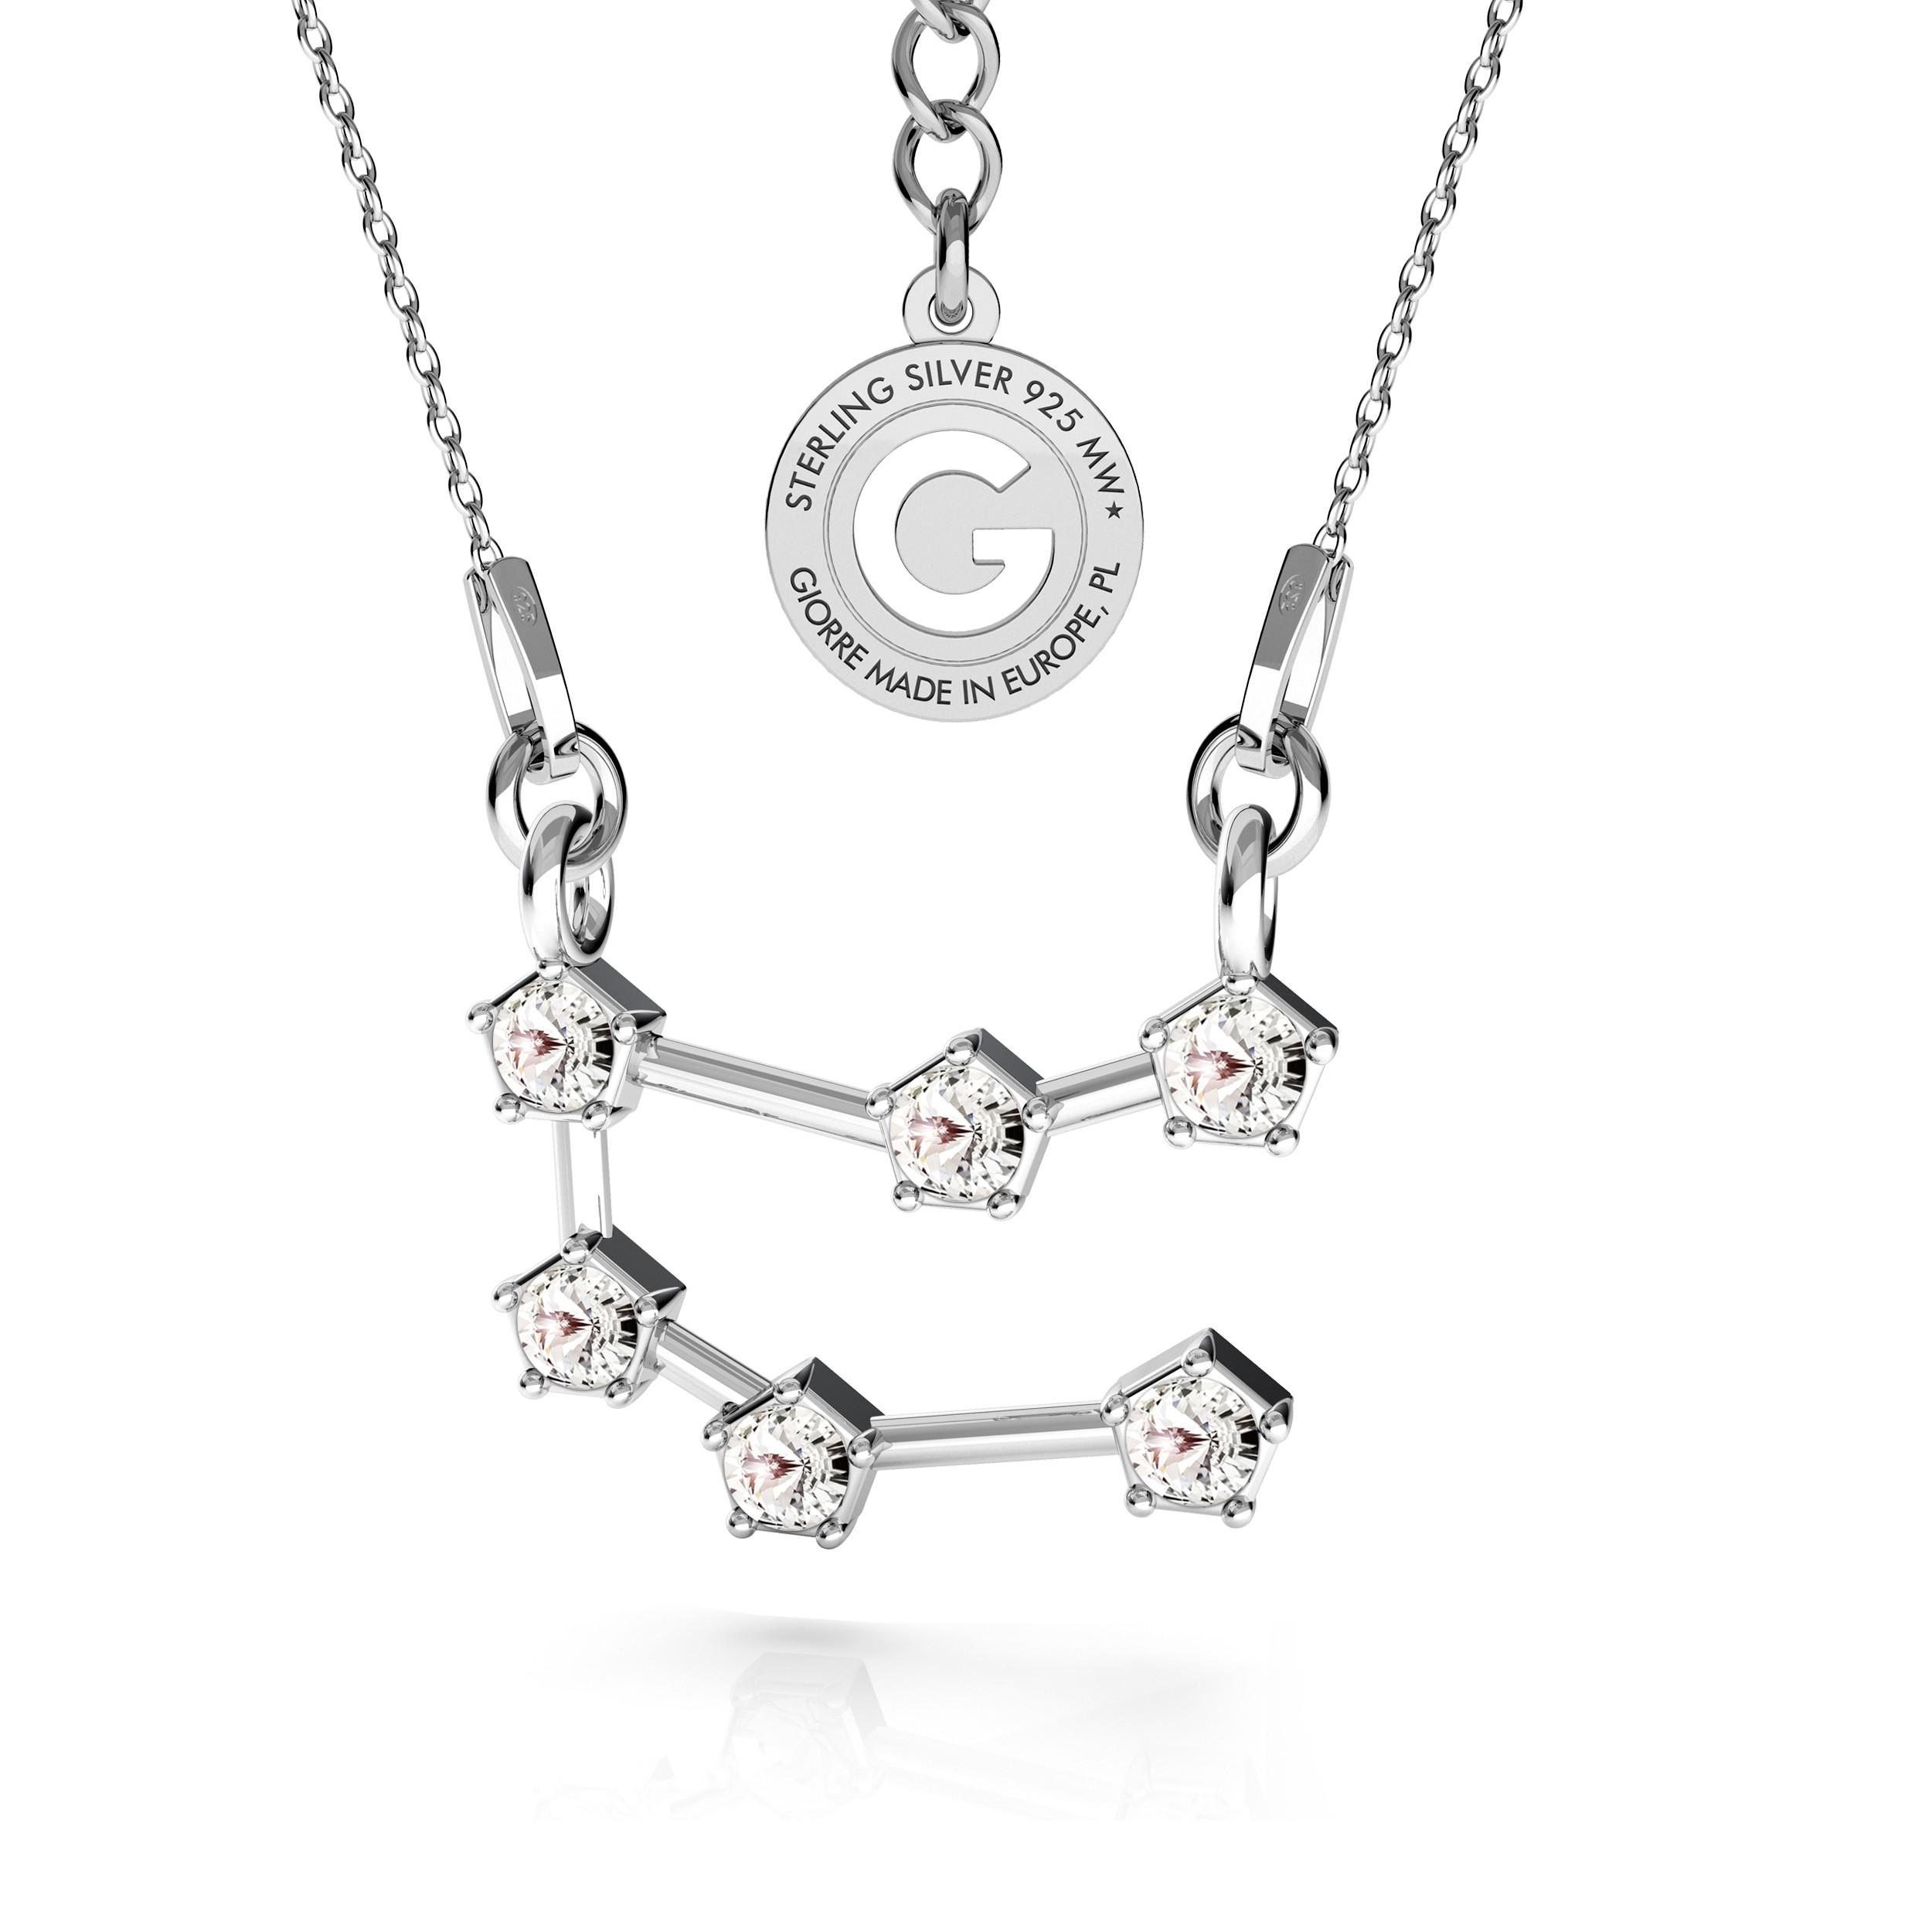 GEMINIS signo del zodiaco collar plata 925 Swarovski